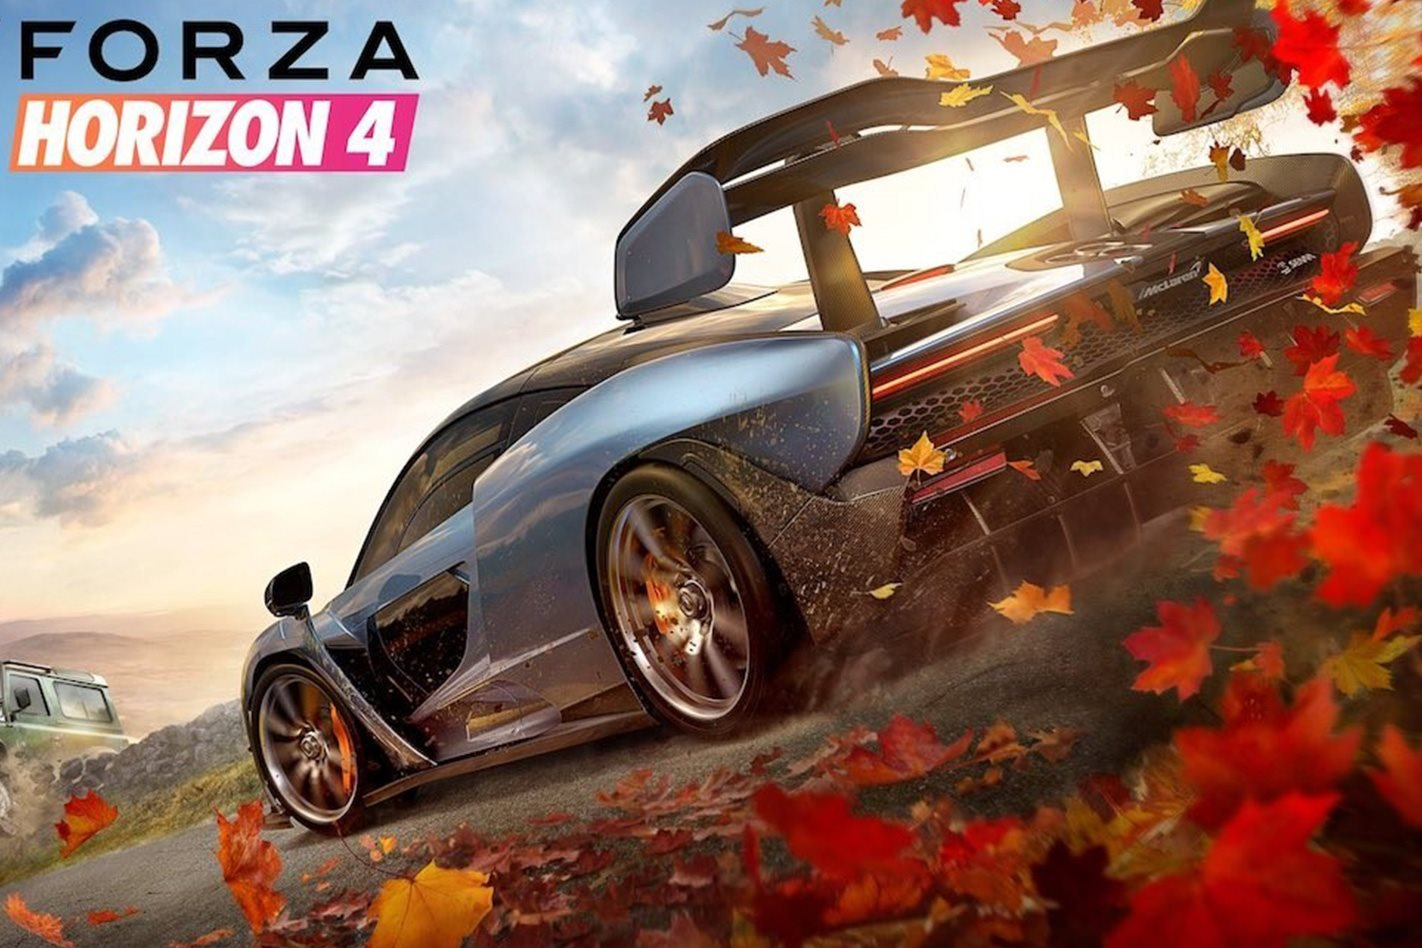 Forza horizon 4 car list leaked ahead of launch for Garage bmw horizon